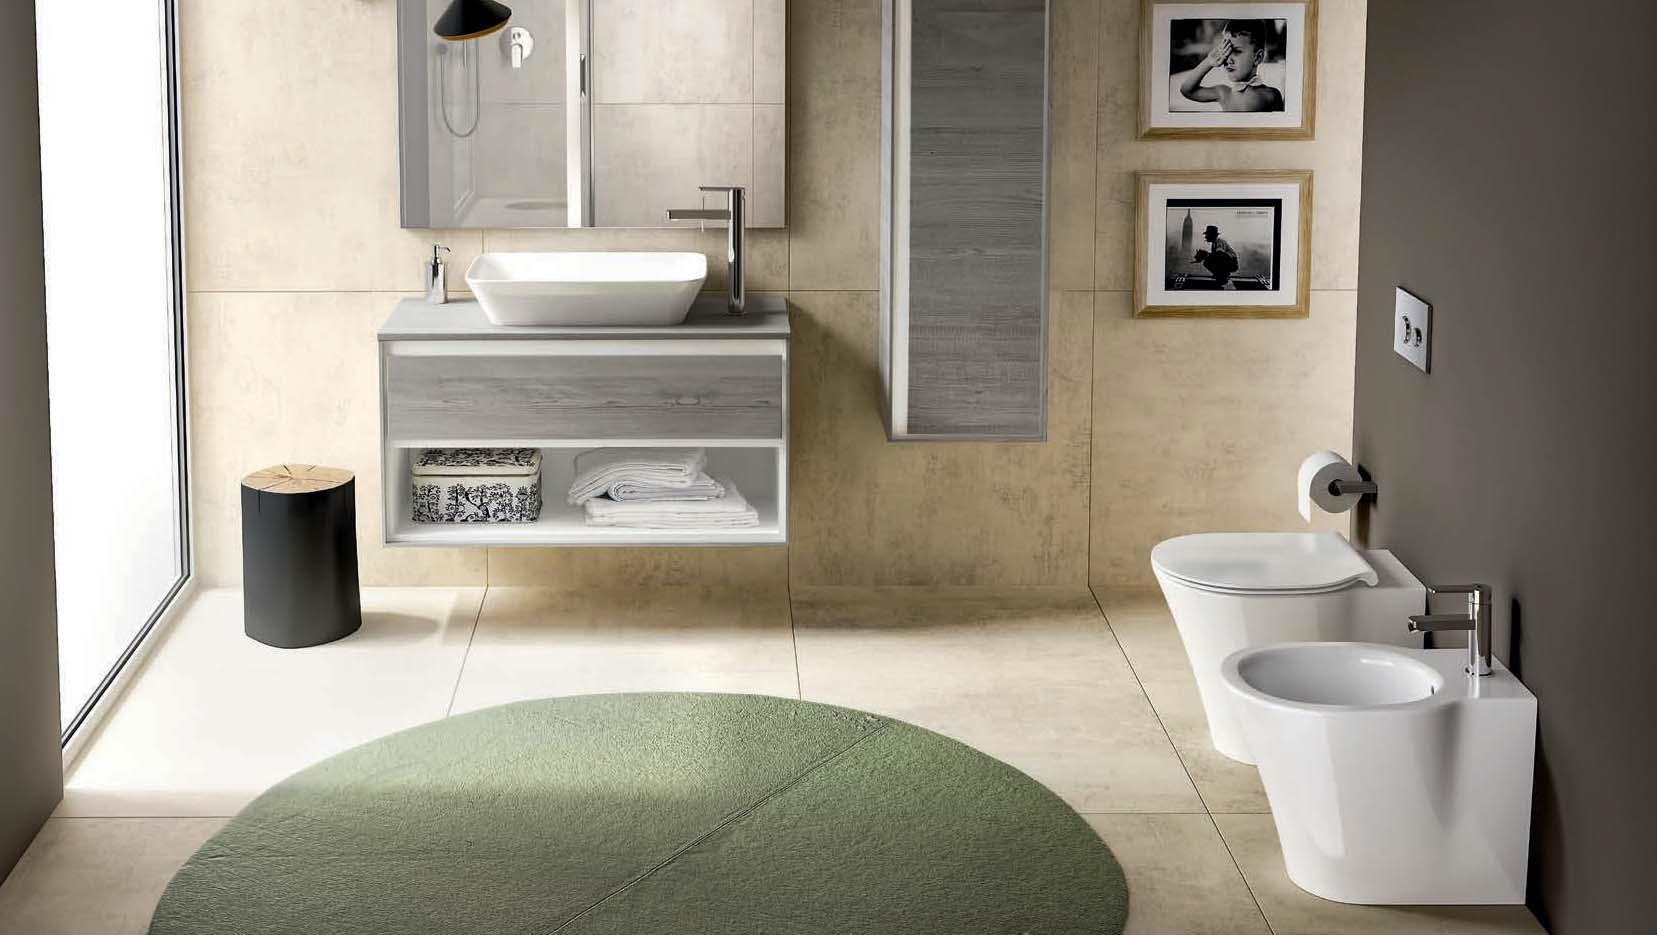 fliesen sanit re badeinrichtung s dtirol connect air. Black Bedroom Furniture Sets. Home Design Ideas